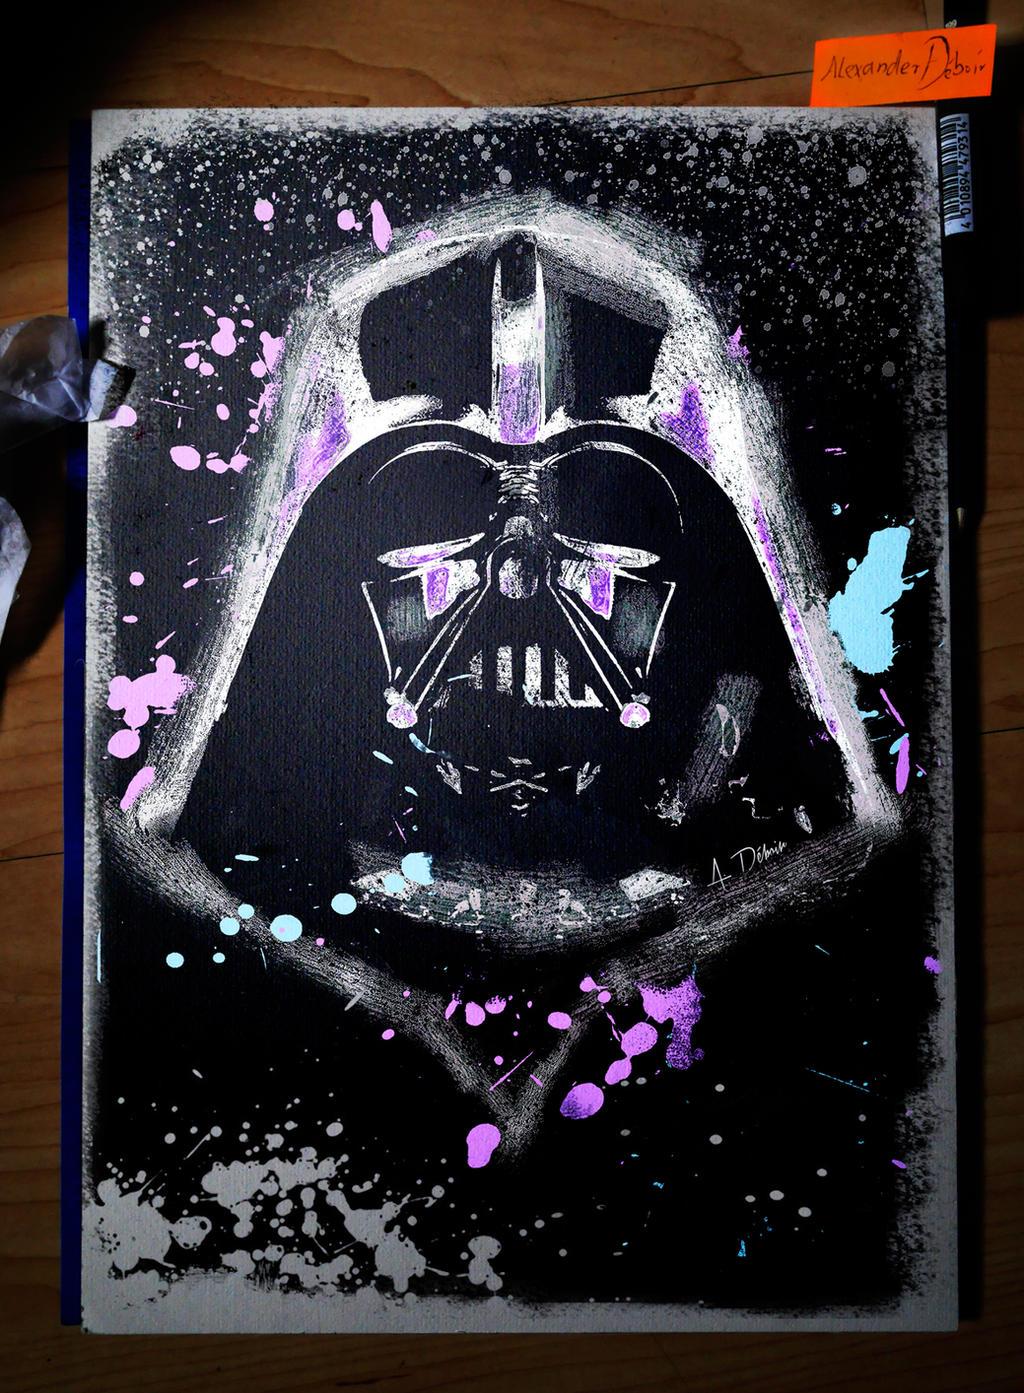 Darth Vader Grunge (Digital Painting) by Deboir on DeviantArt